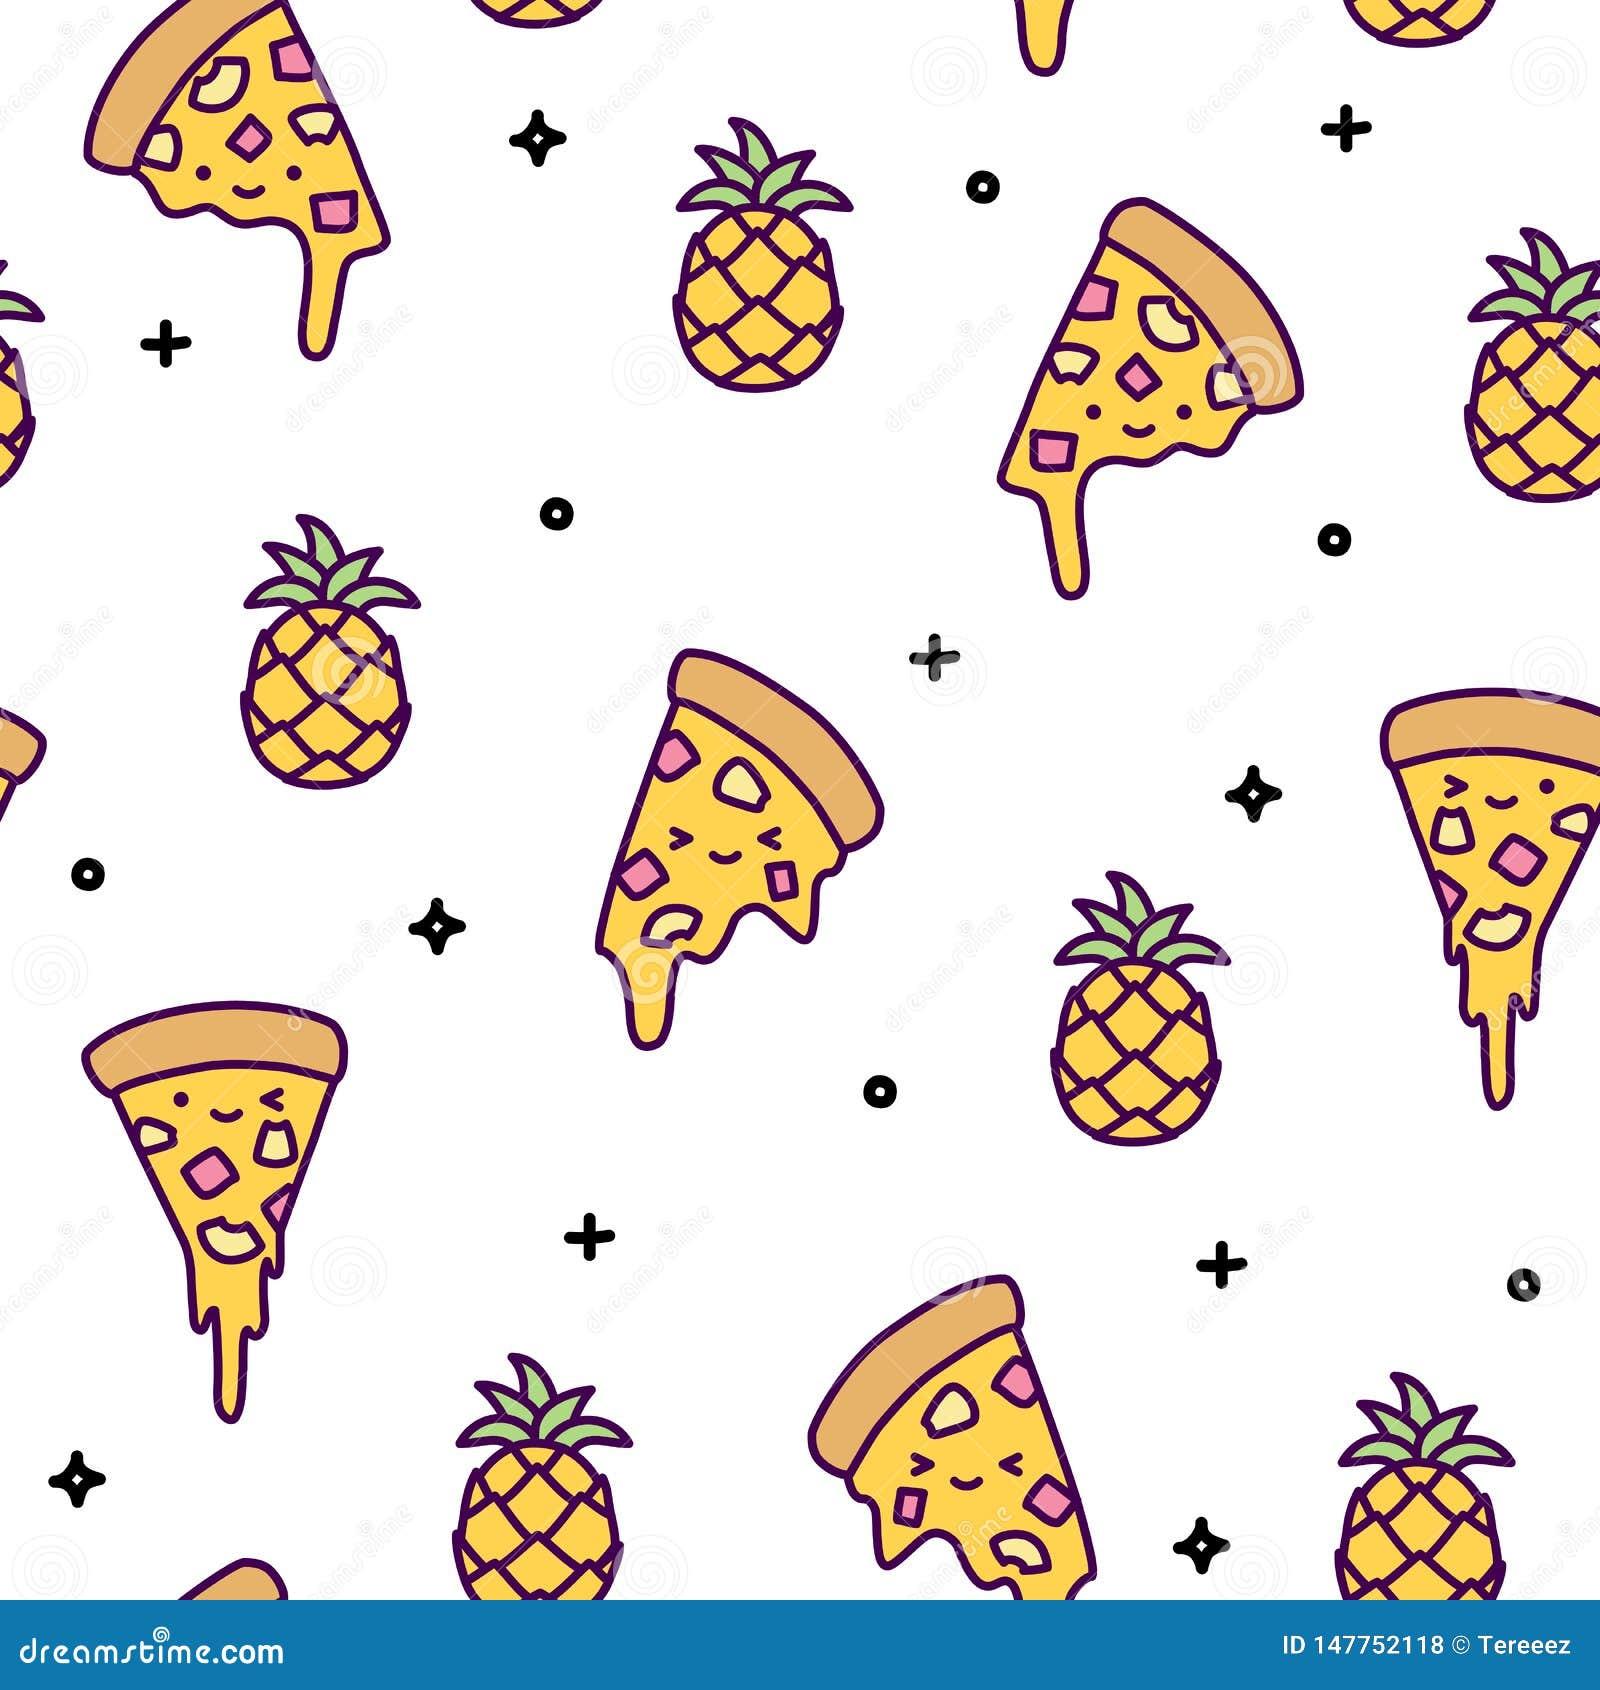 Pineapple Pizza Stock Illustrations – 1,376 Pineapple ...